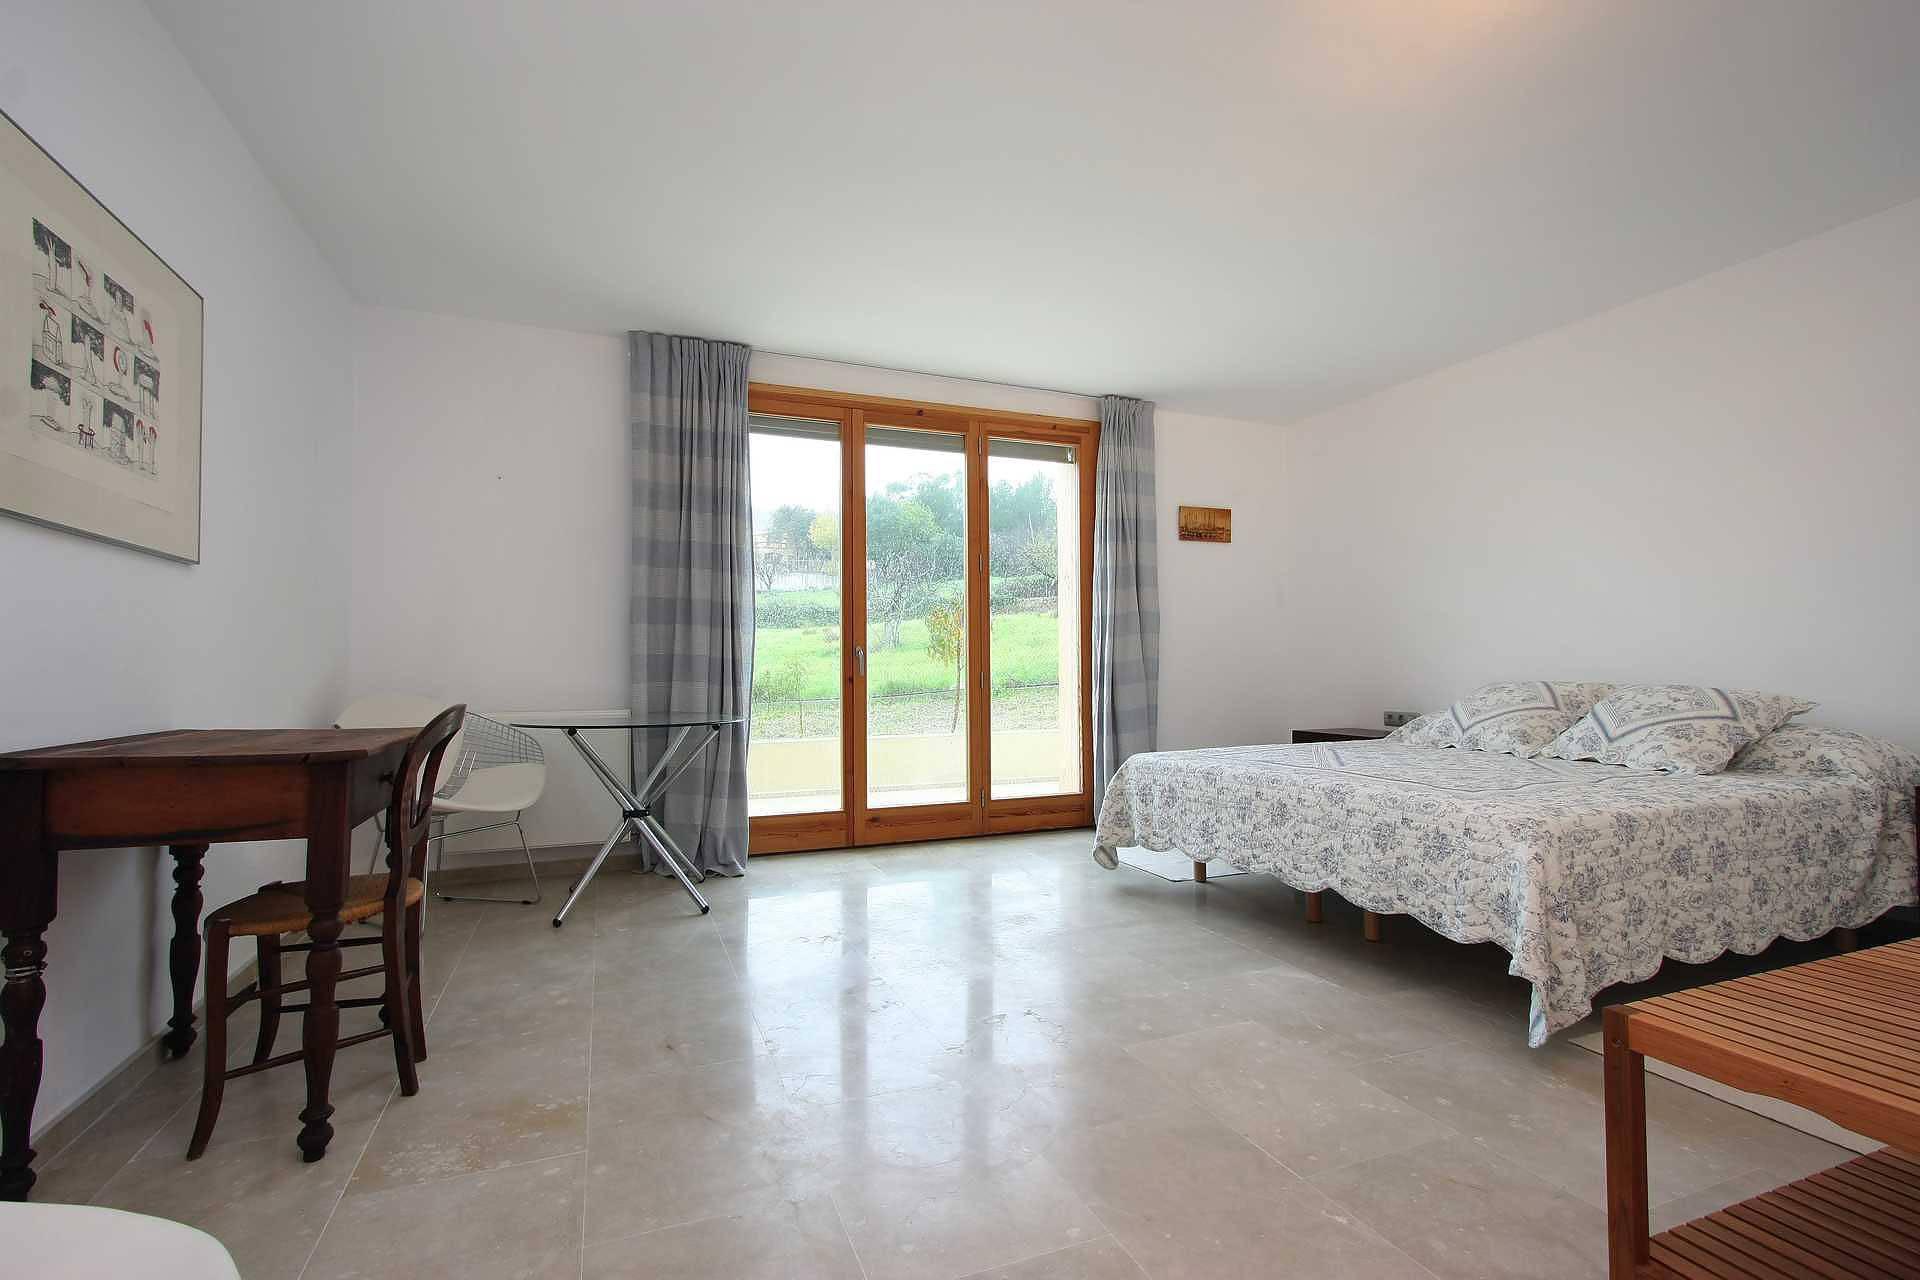 01-36 klassische Villa Mallorca Norden Bild 28